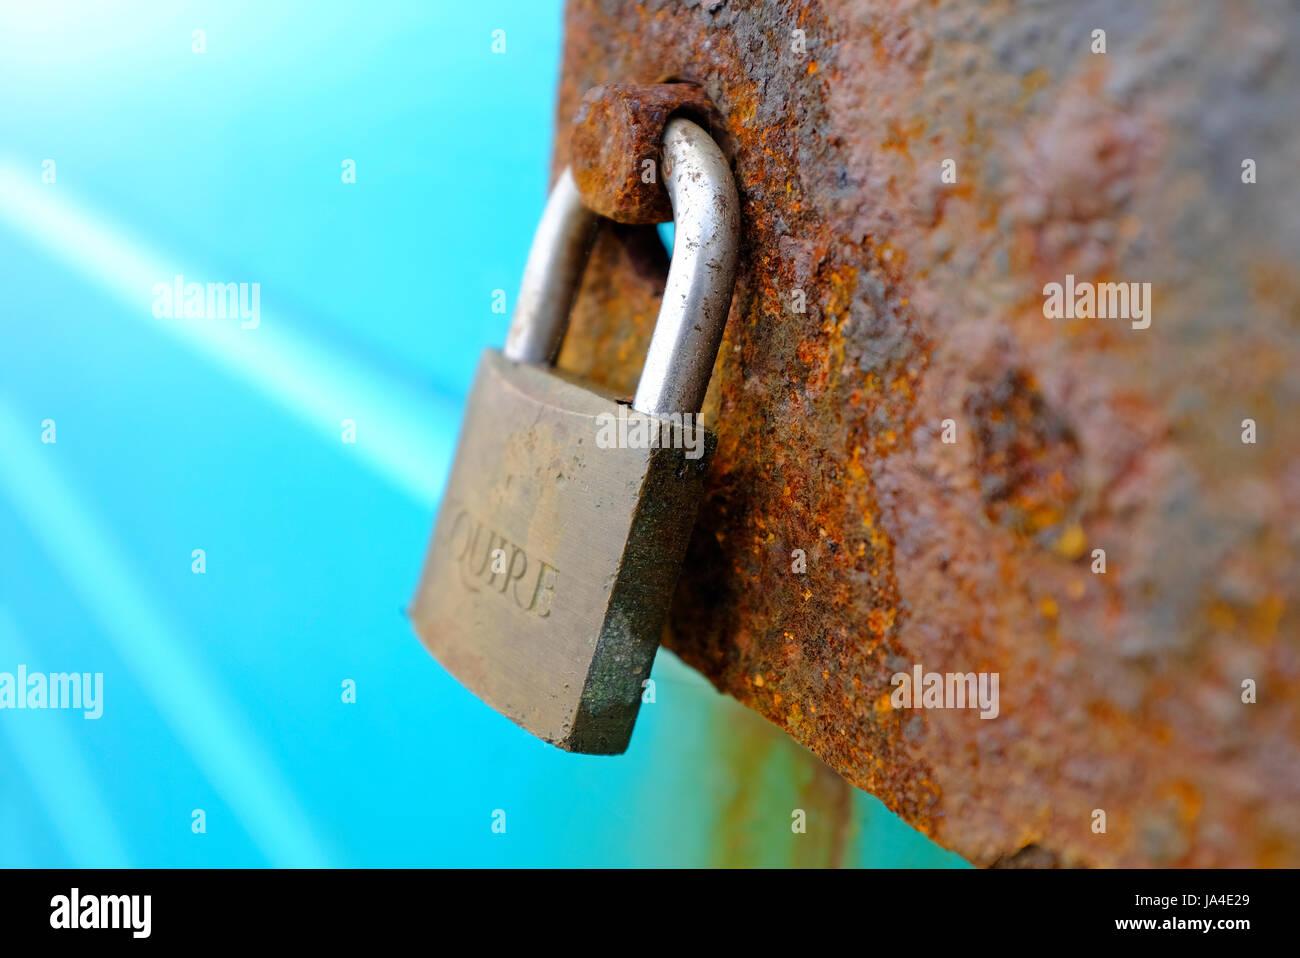 brass locked padlock on beach hut - Stock Image